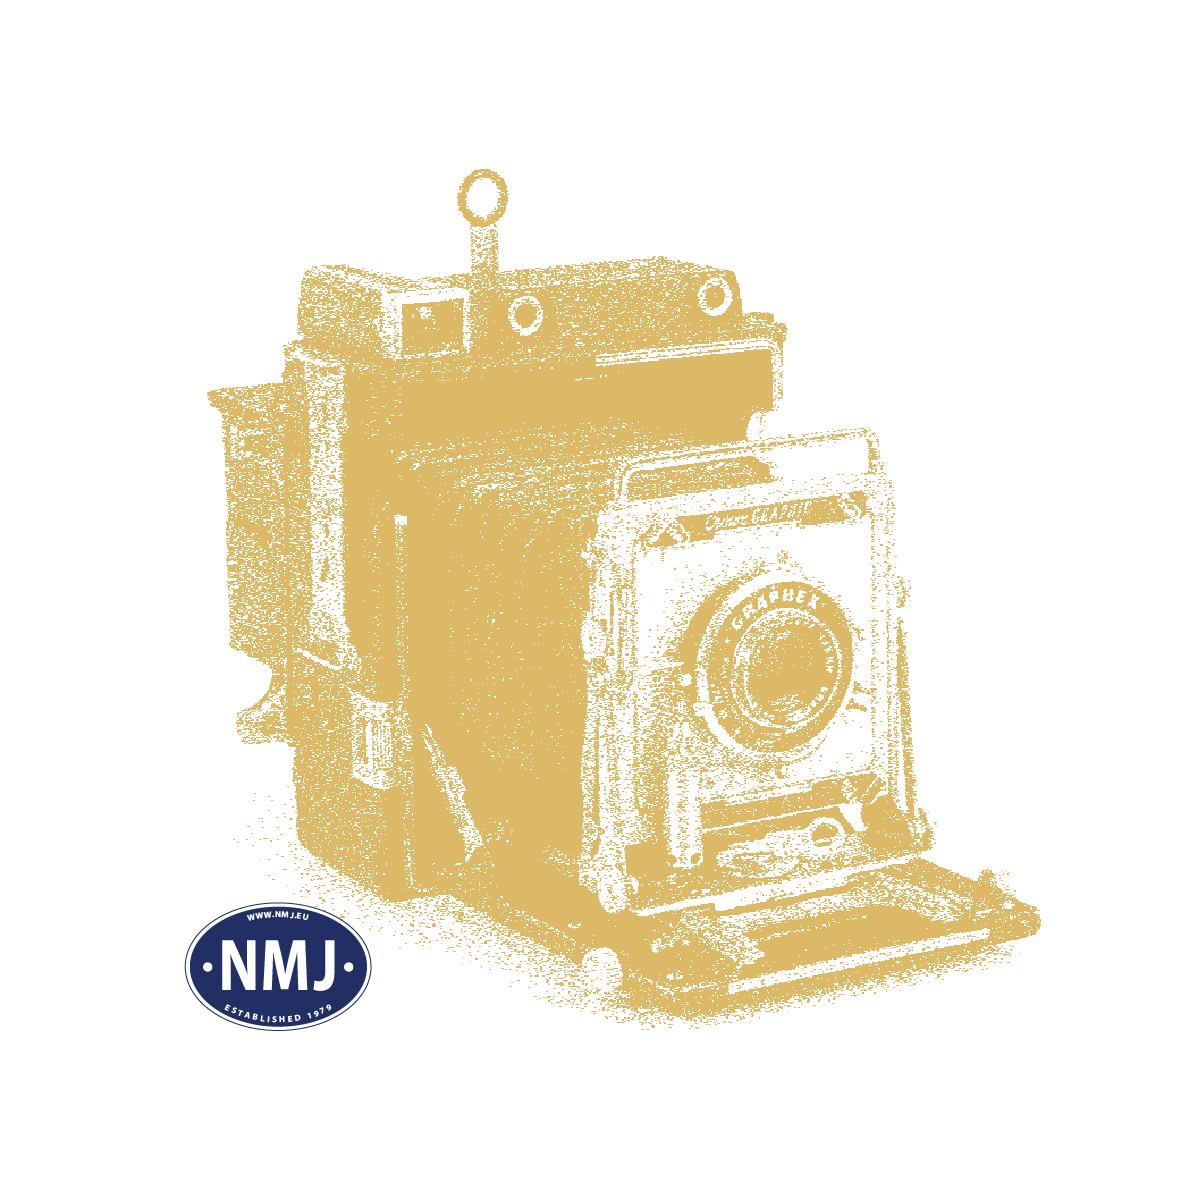 NMJT86.102AC - NMJ Zugpaket: NSB El11 mit 8 Güterwagen, 1952 - 1971, AC Digital